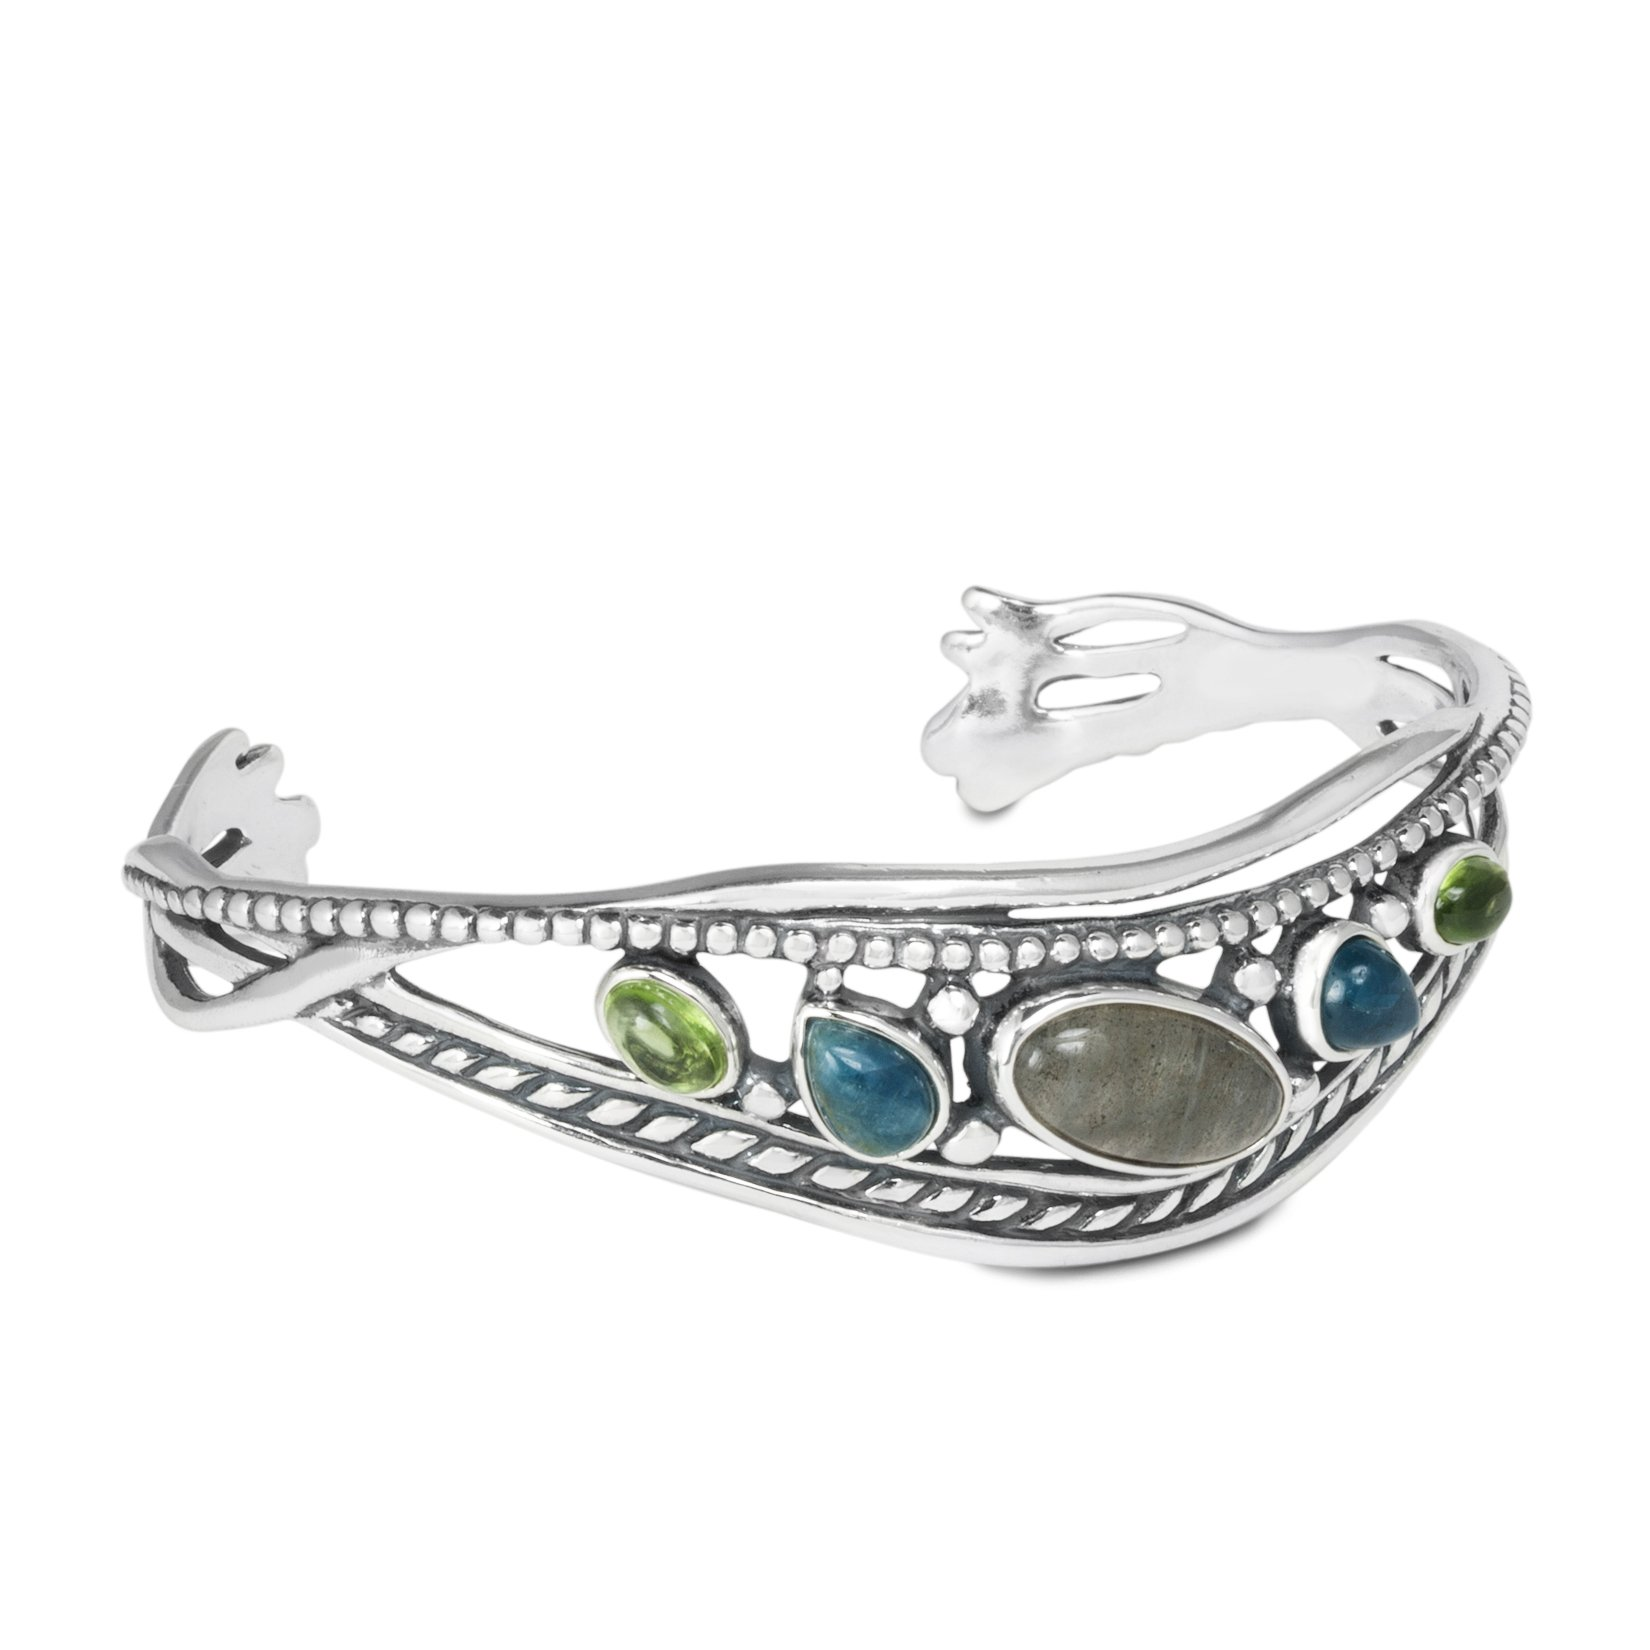 Relios Sterling Silver Multi-Gemstone Cuff Bracelet